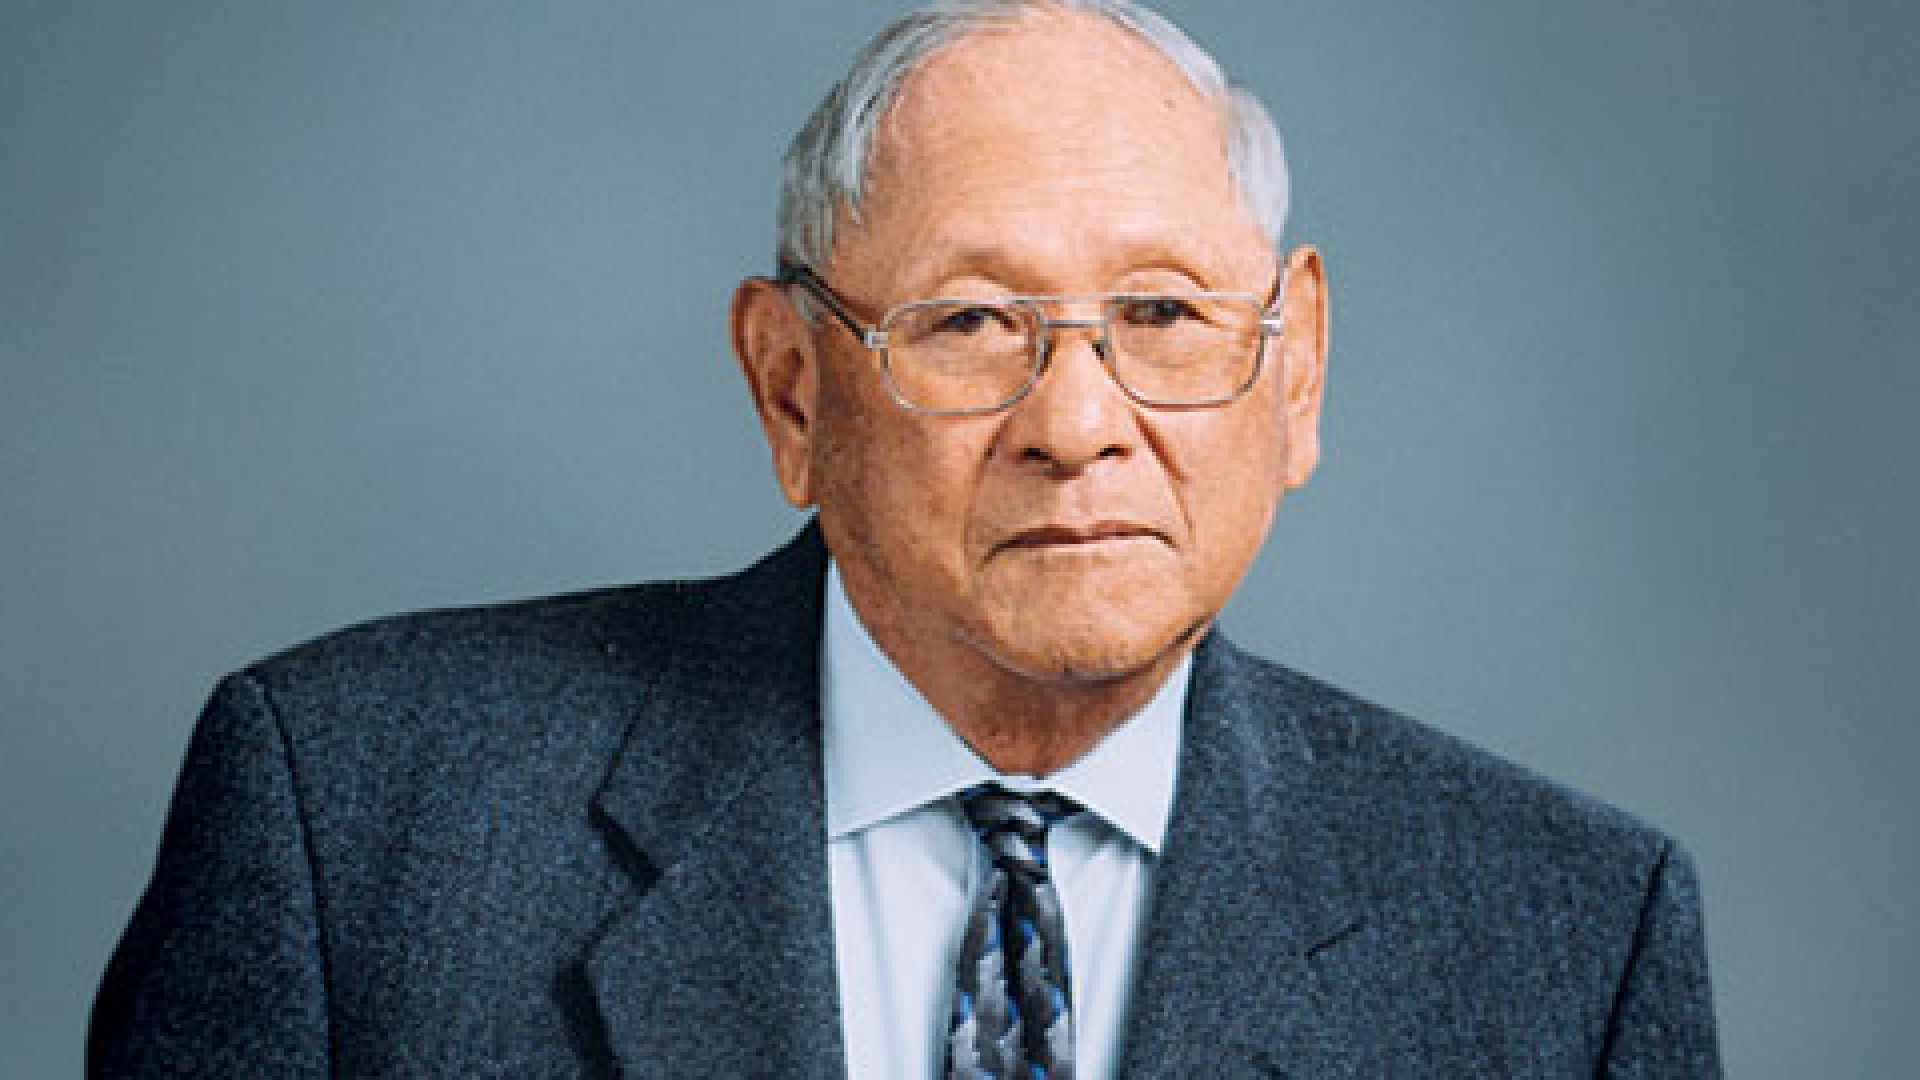 <strong>GROUNDED</strong> John Tanimura was the real farmer in a half-a-billiondollar farm company.